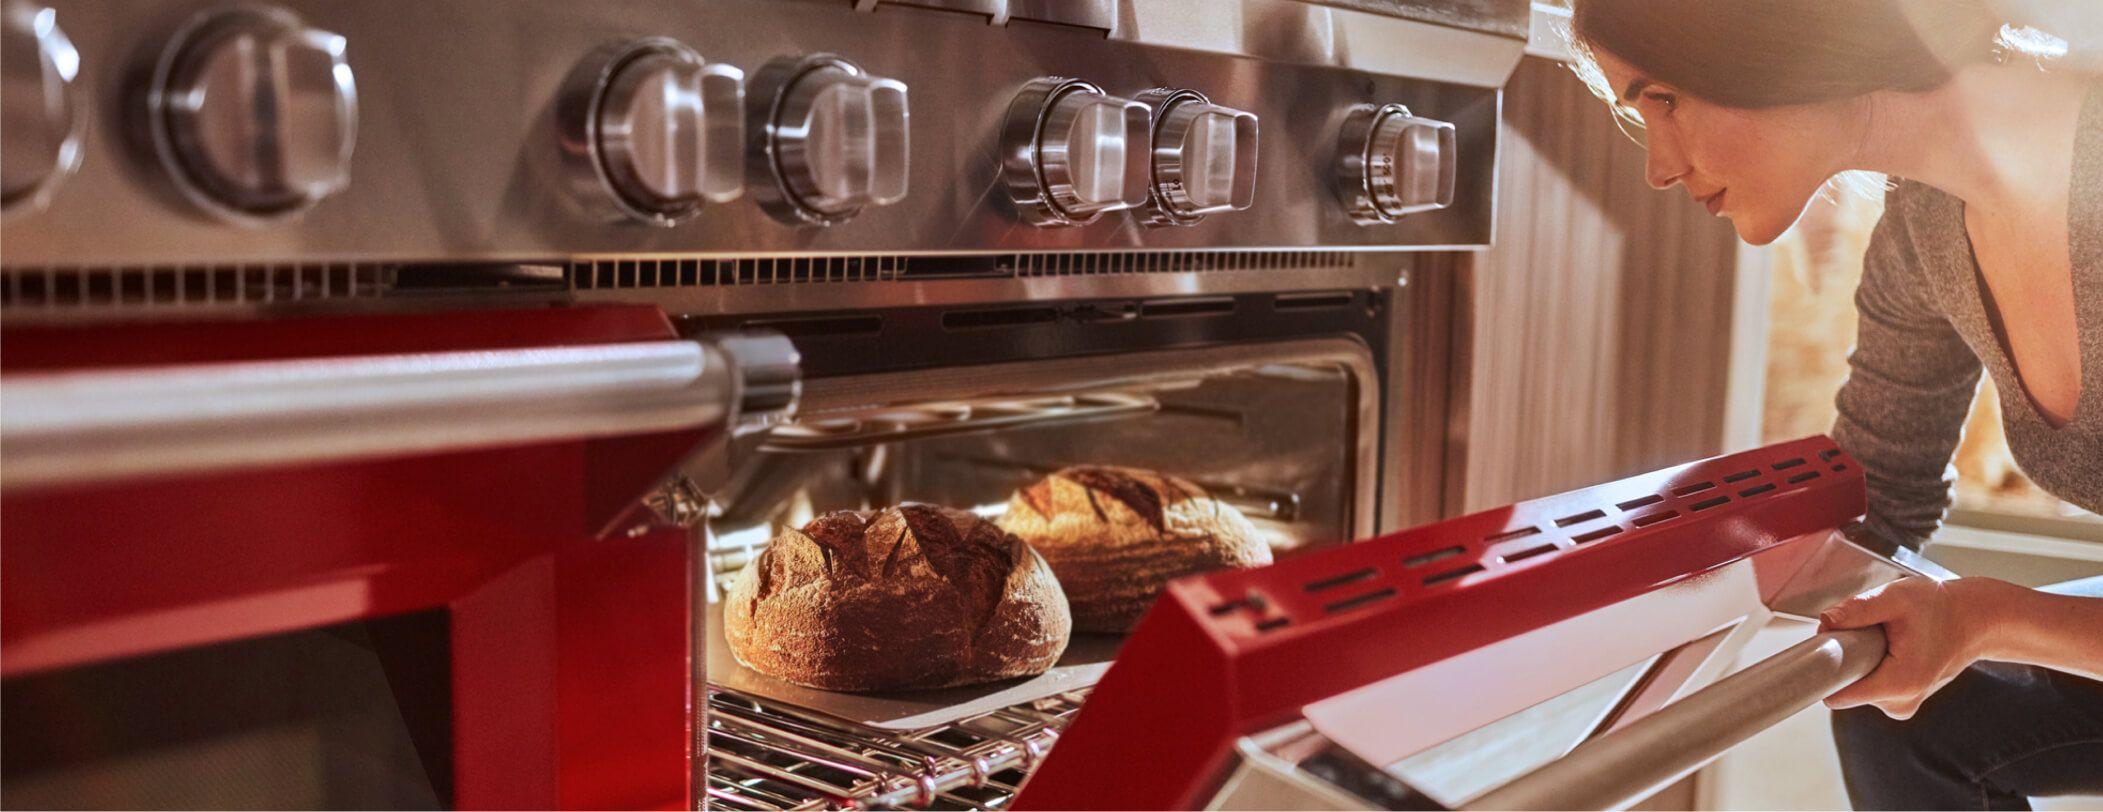 Major Kitchen Appliances Kitchenaid